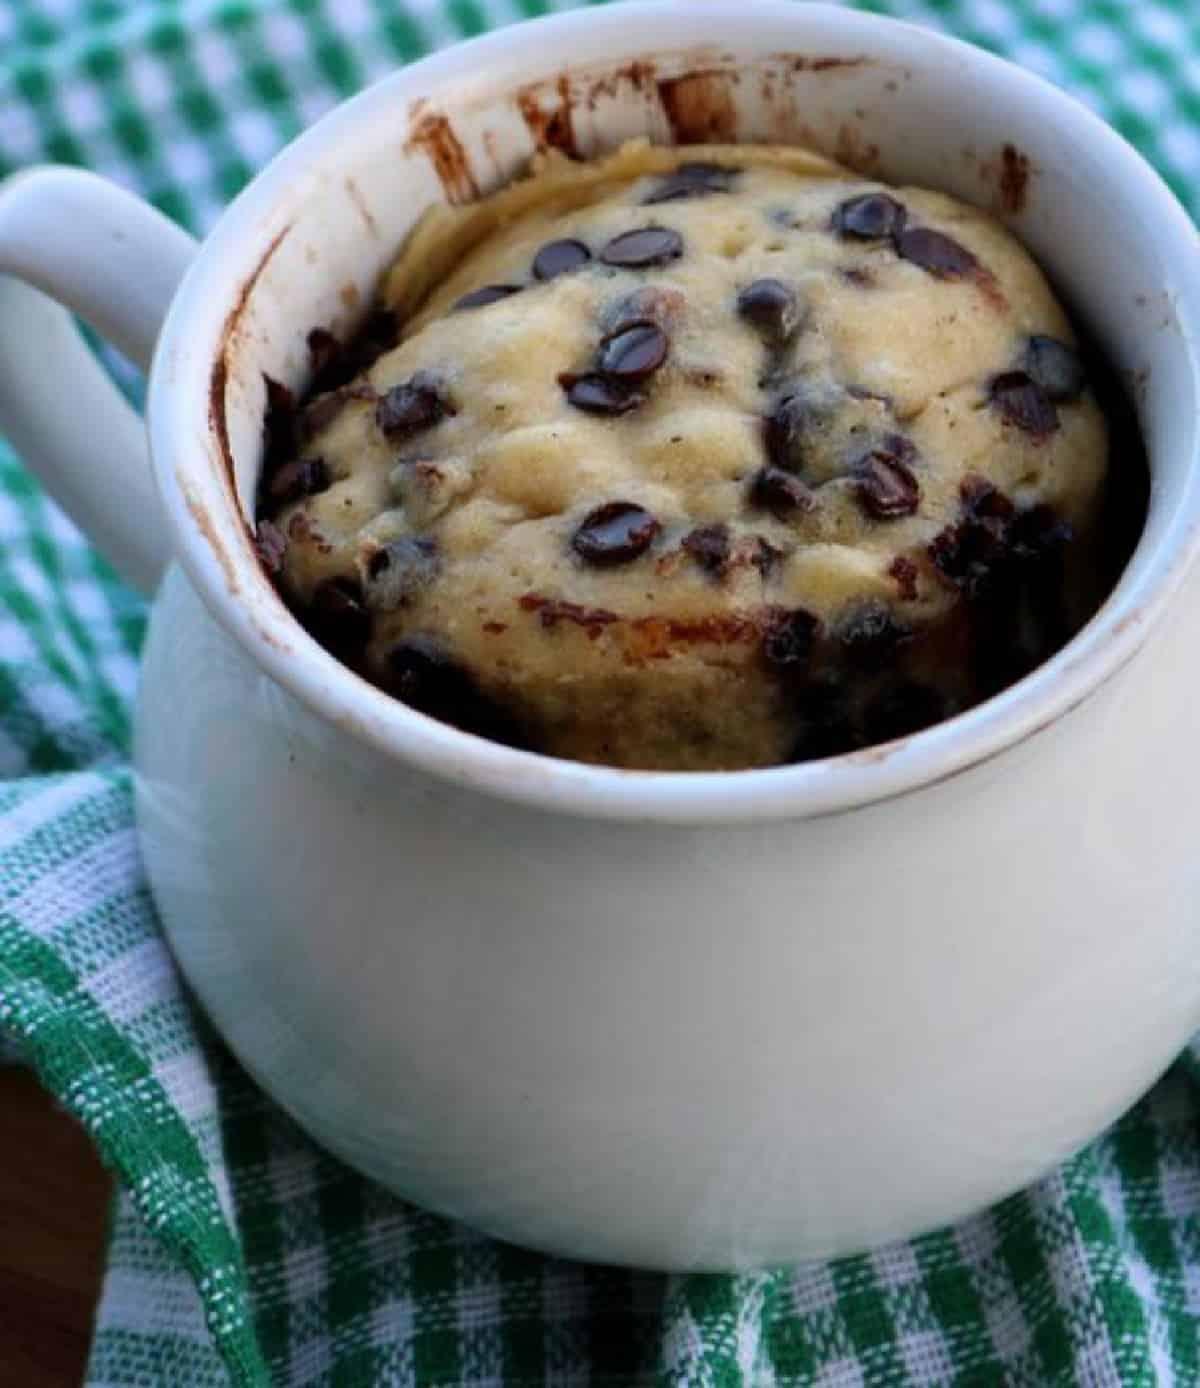 White mug with microwave chocolate chip cookies.